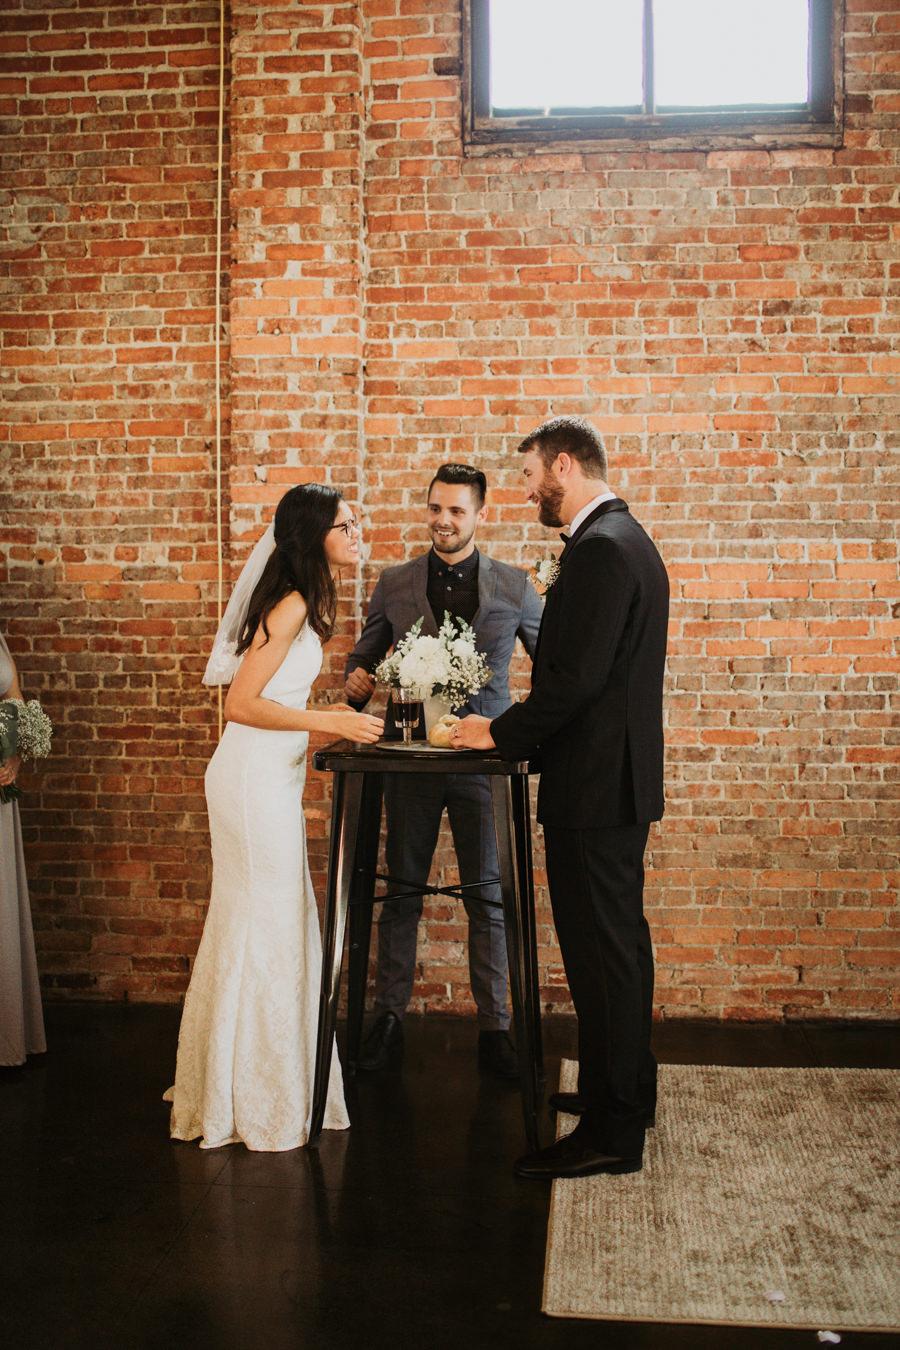 Tampa Heights Industrial Wedding at Cavu Emmy RJ-77.jpg